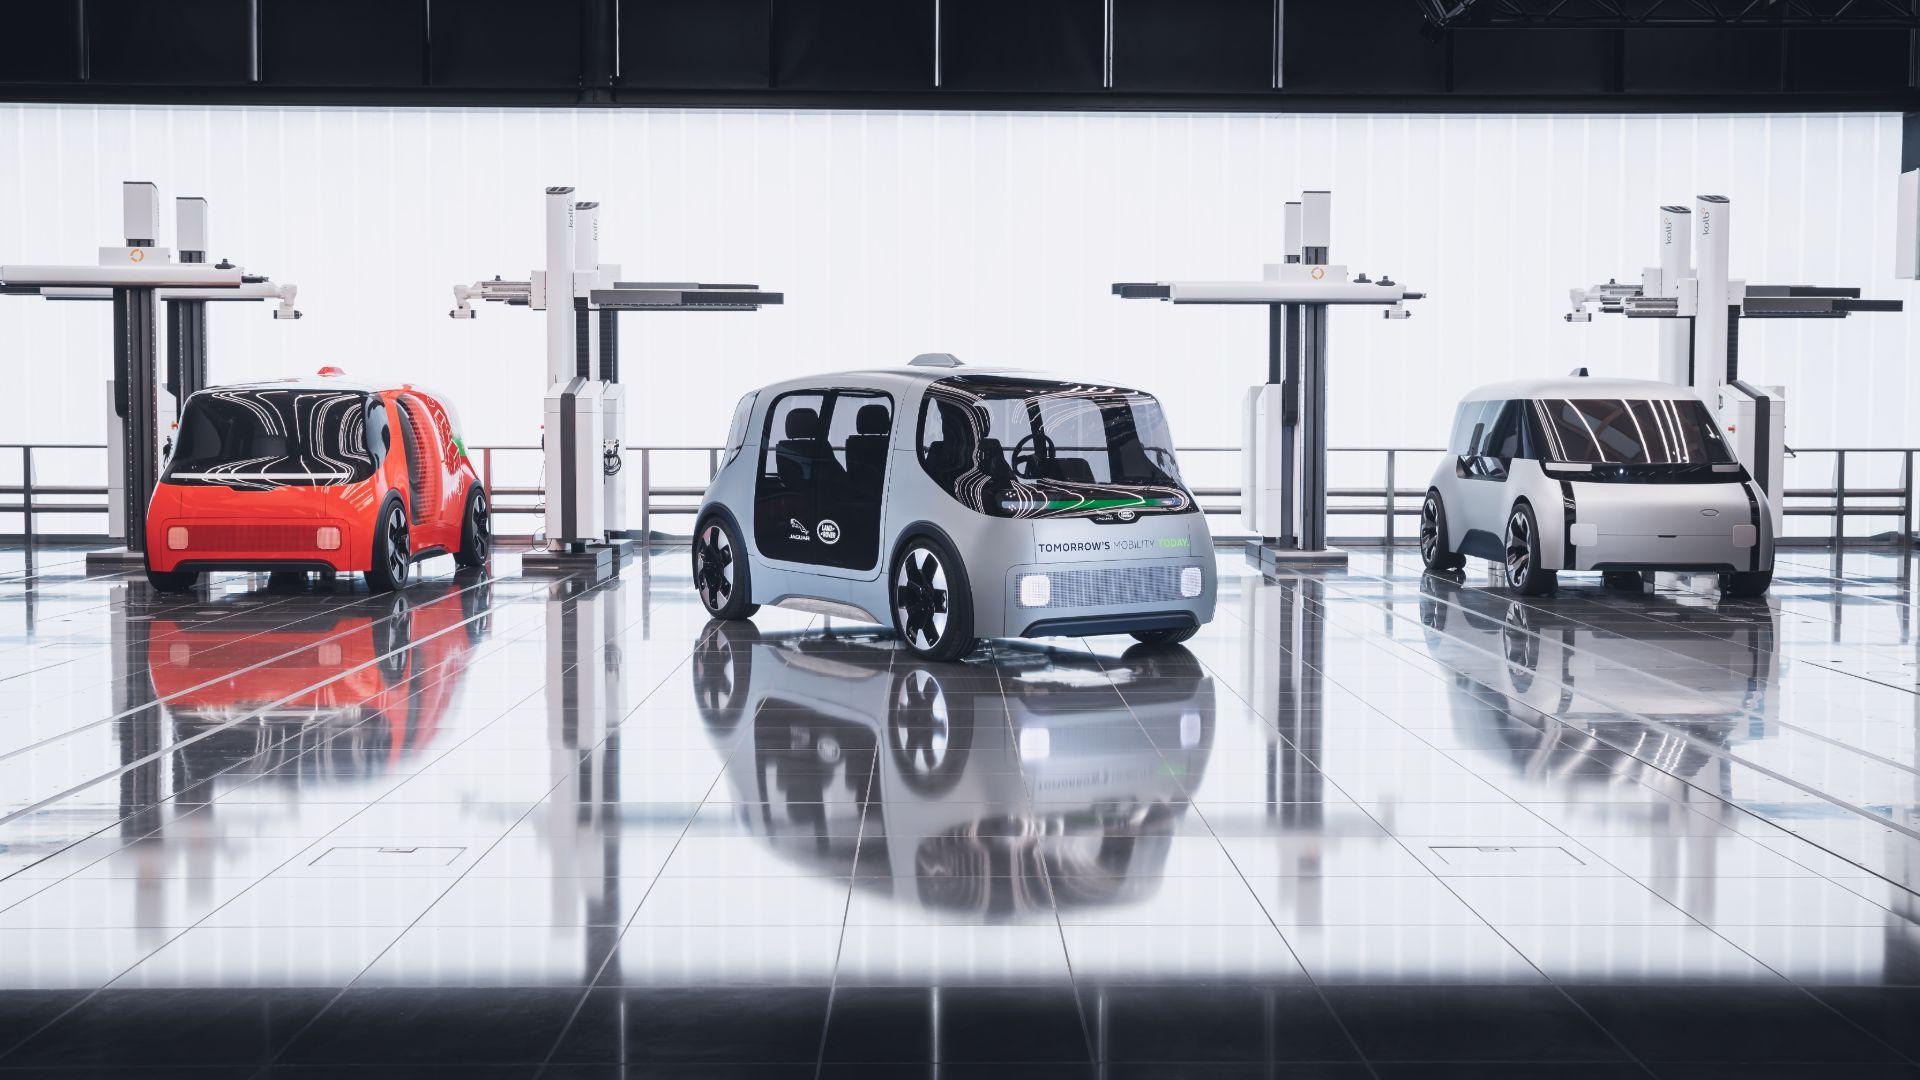 JLR Project Vector, autonomous pod for the future